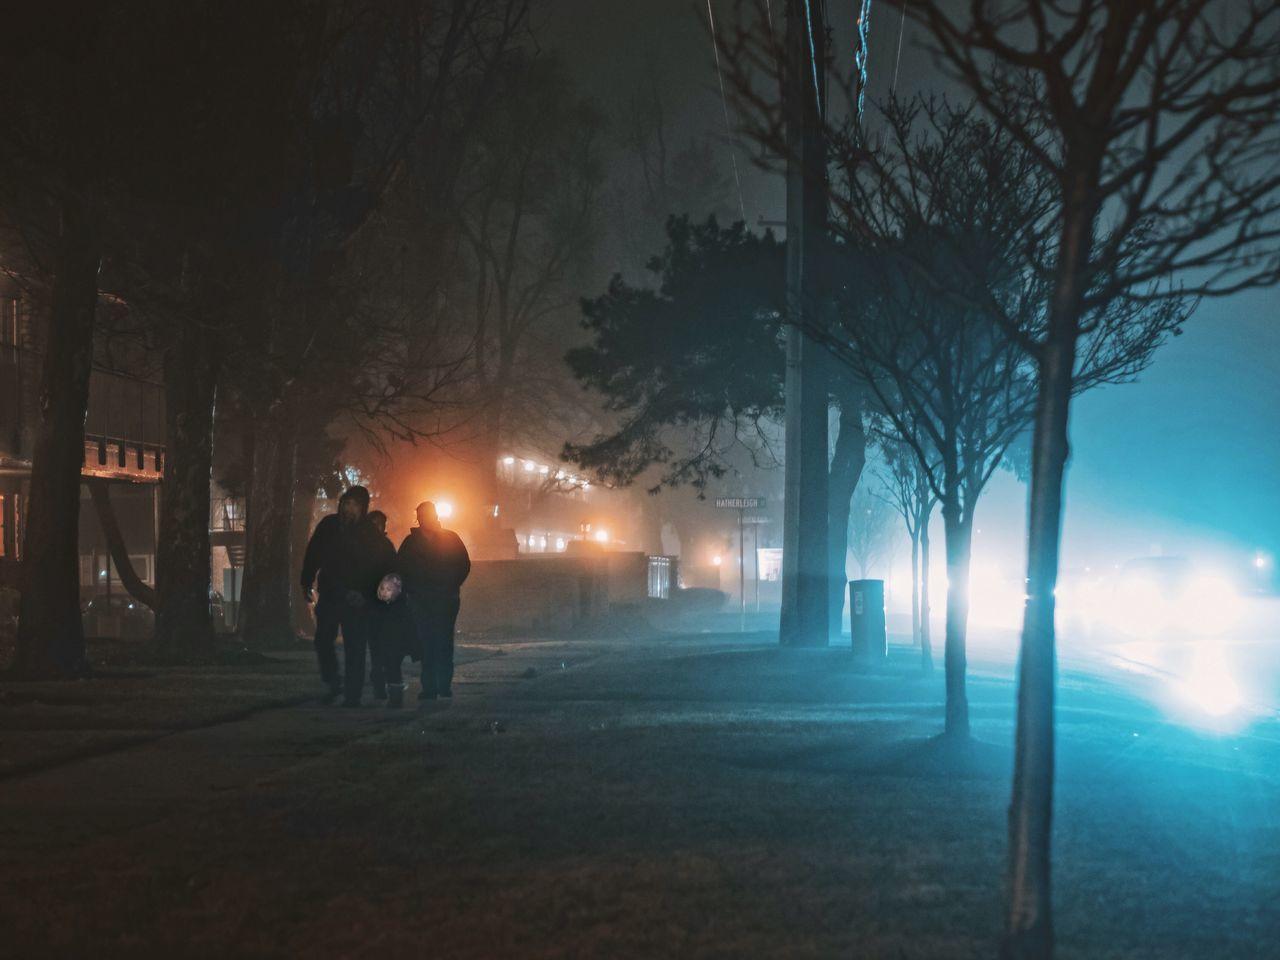 Illuminated Outdoors Night Fog People Streetphotography Colors Moody Cinematic Mystery Trees Light EyeEm Best Shots